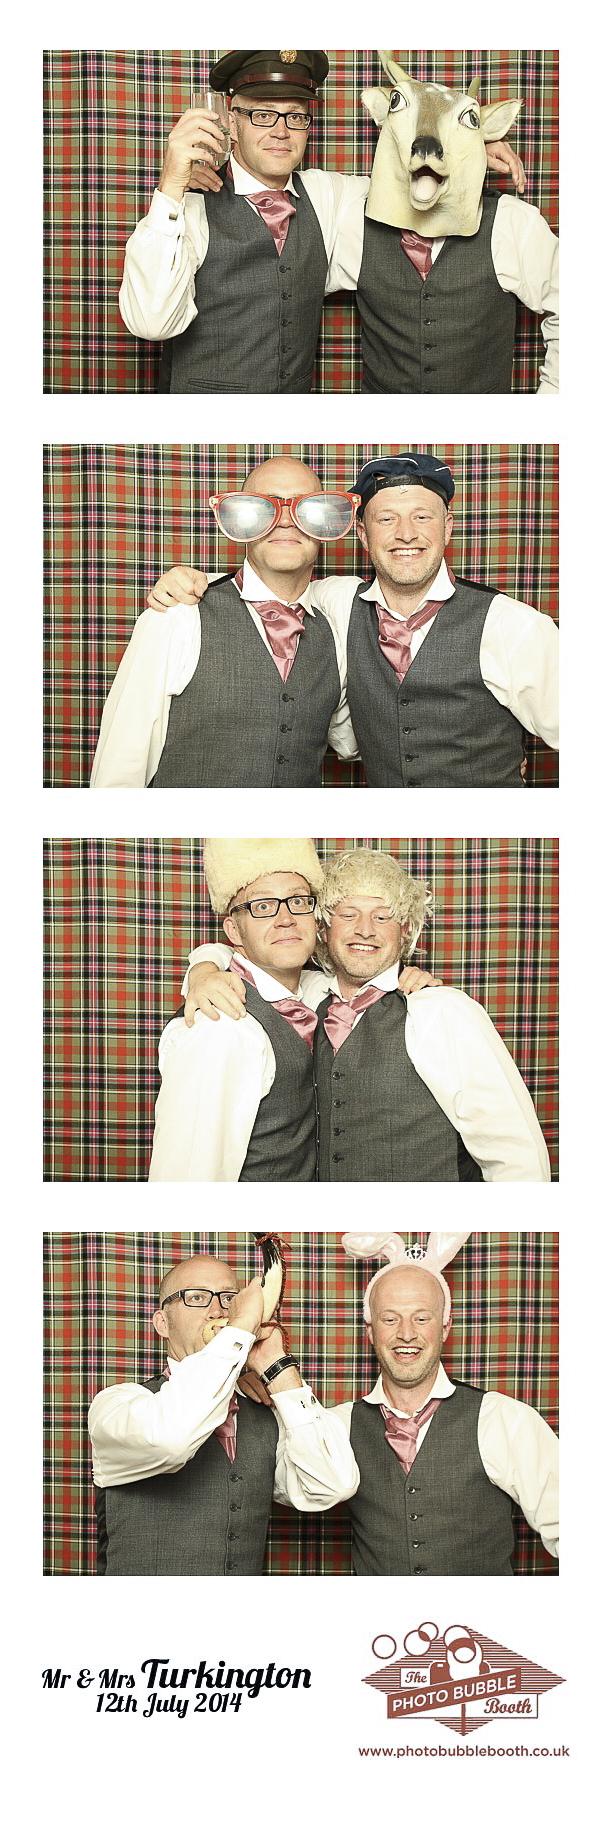 Mr & Mrs Turkington Photobooth _1.JPG